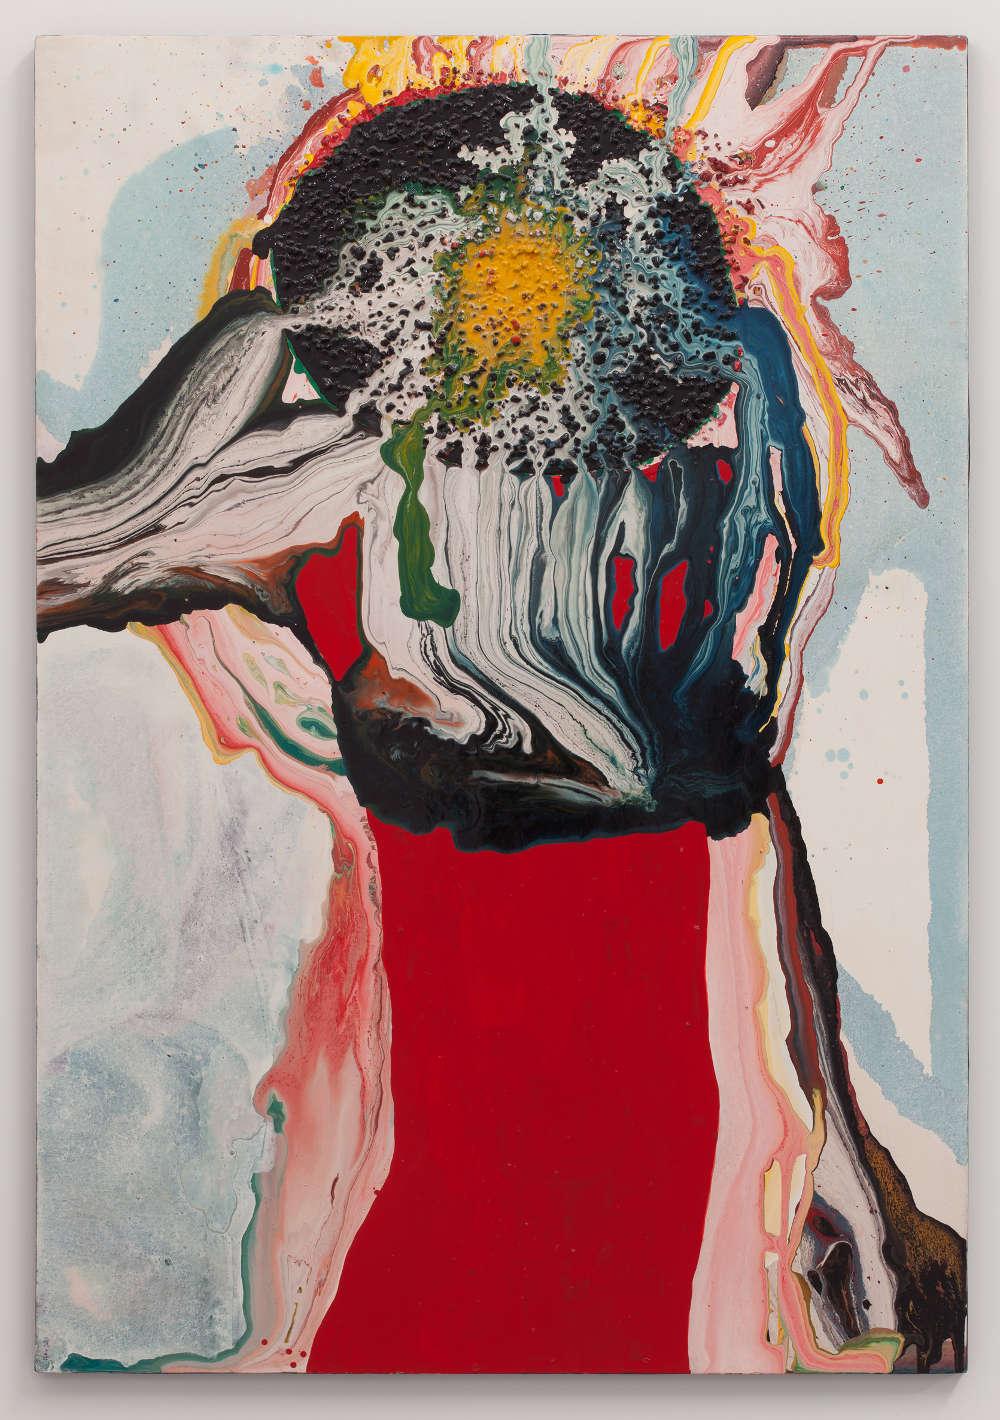 Sadamasa Motonaga, Work, 1963. Oil and gravel on canvas 71 5/8 x 53 1/8 inches (181.9 x 134.9 cm)